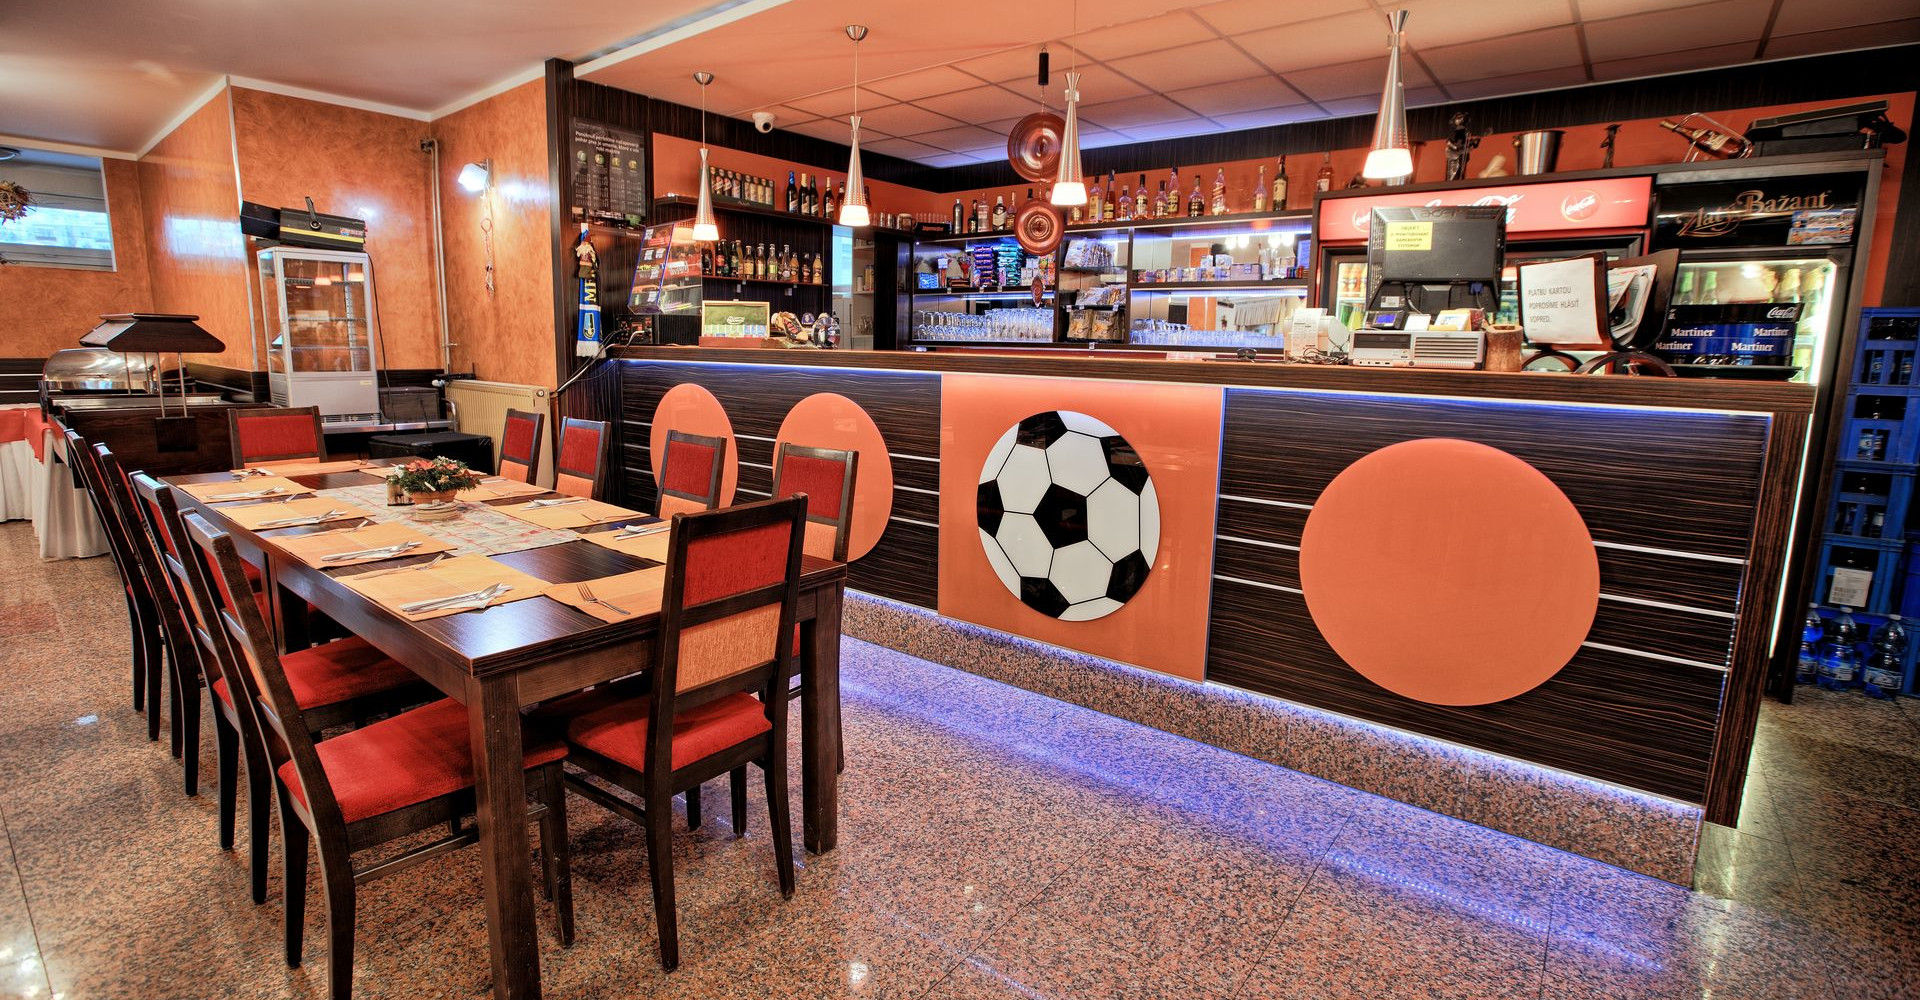 55398b6000d3c Reštaurácia a turistická ubytovňa Kopačka – Reštaurácia a turistická ...